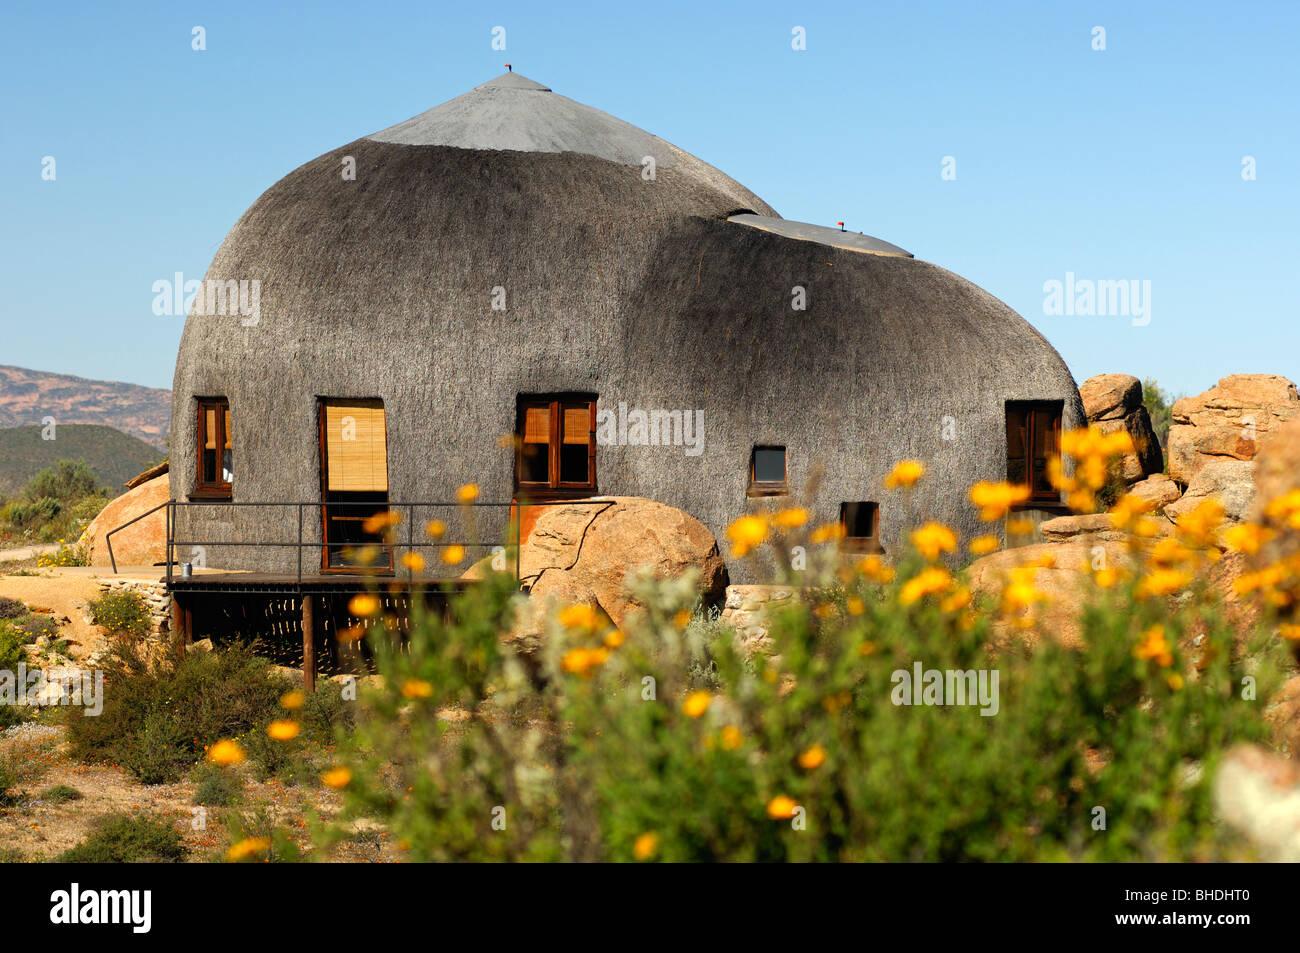 Dome-shaped Namakwa Mountain Suite, Naries Namakwa Retreat, Naries, South Africa - Stock Image